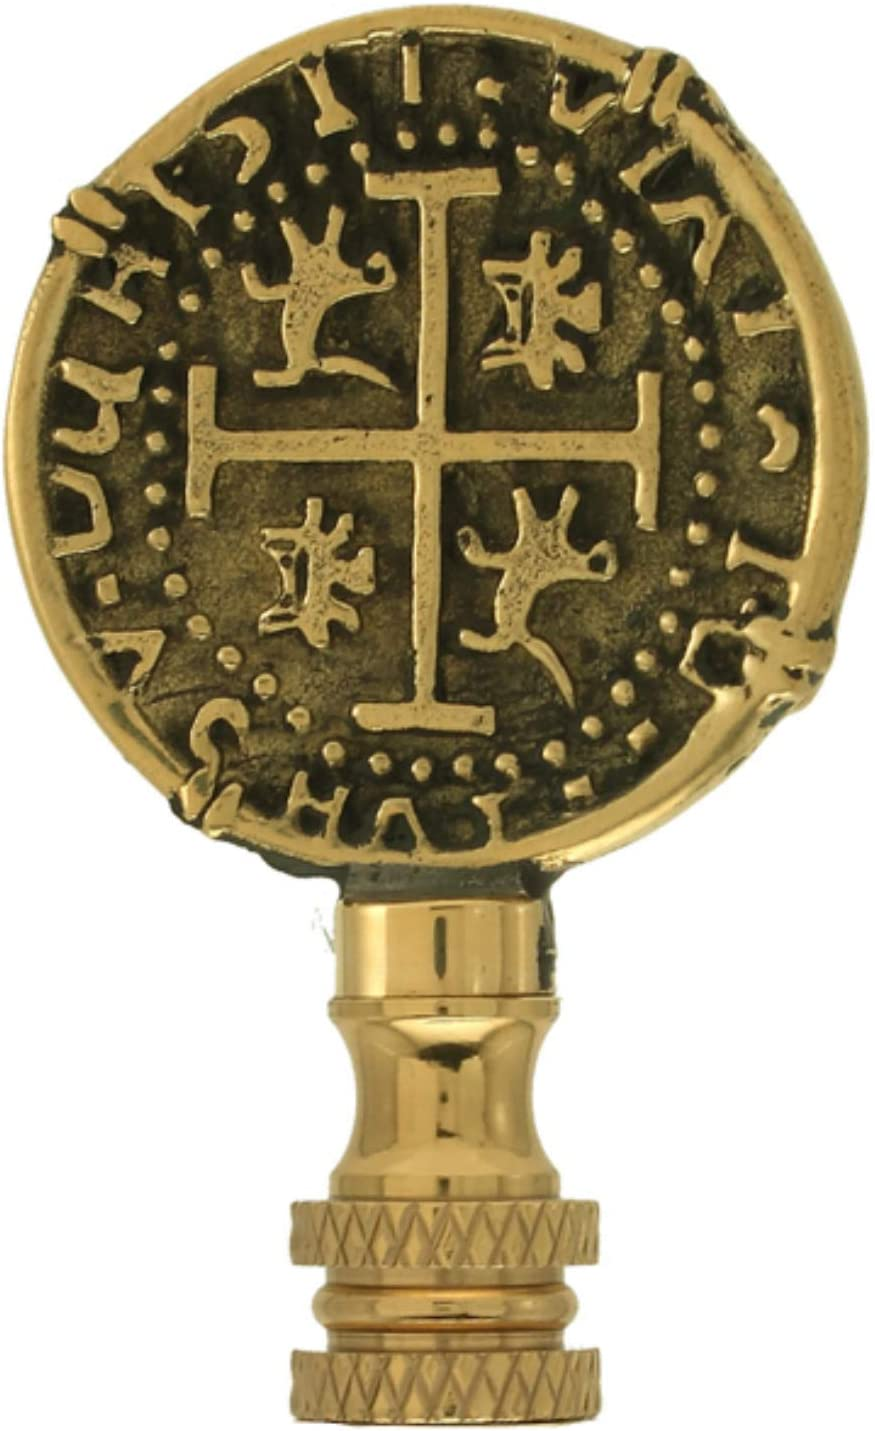 Brass Pirate Doubloon Coin Finial Nauitical Lamp Shade Topper Lampshade Screw Dubloon Sea Beach Ocean